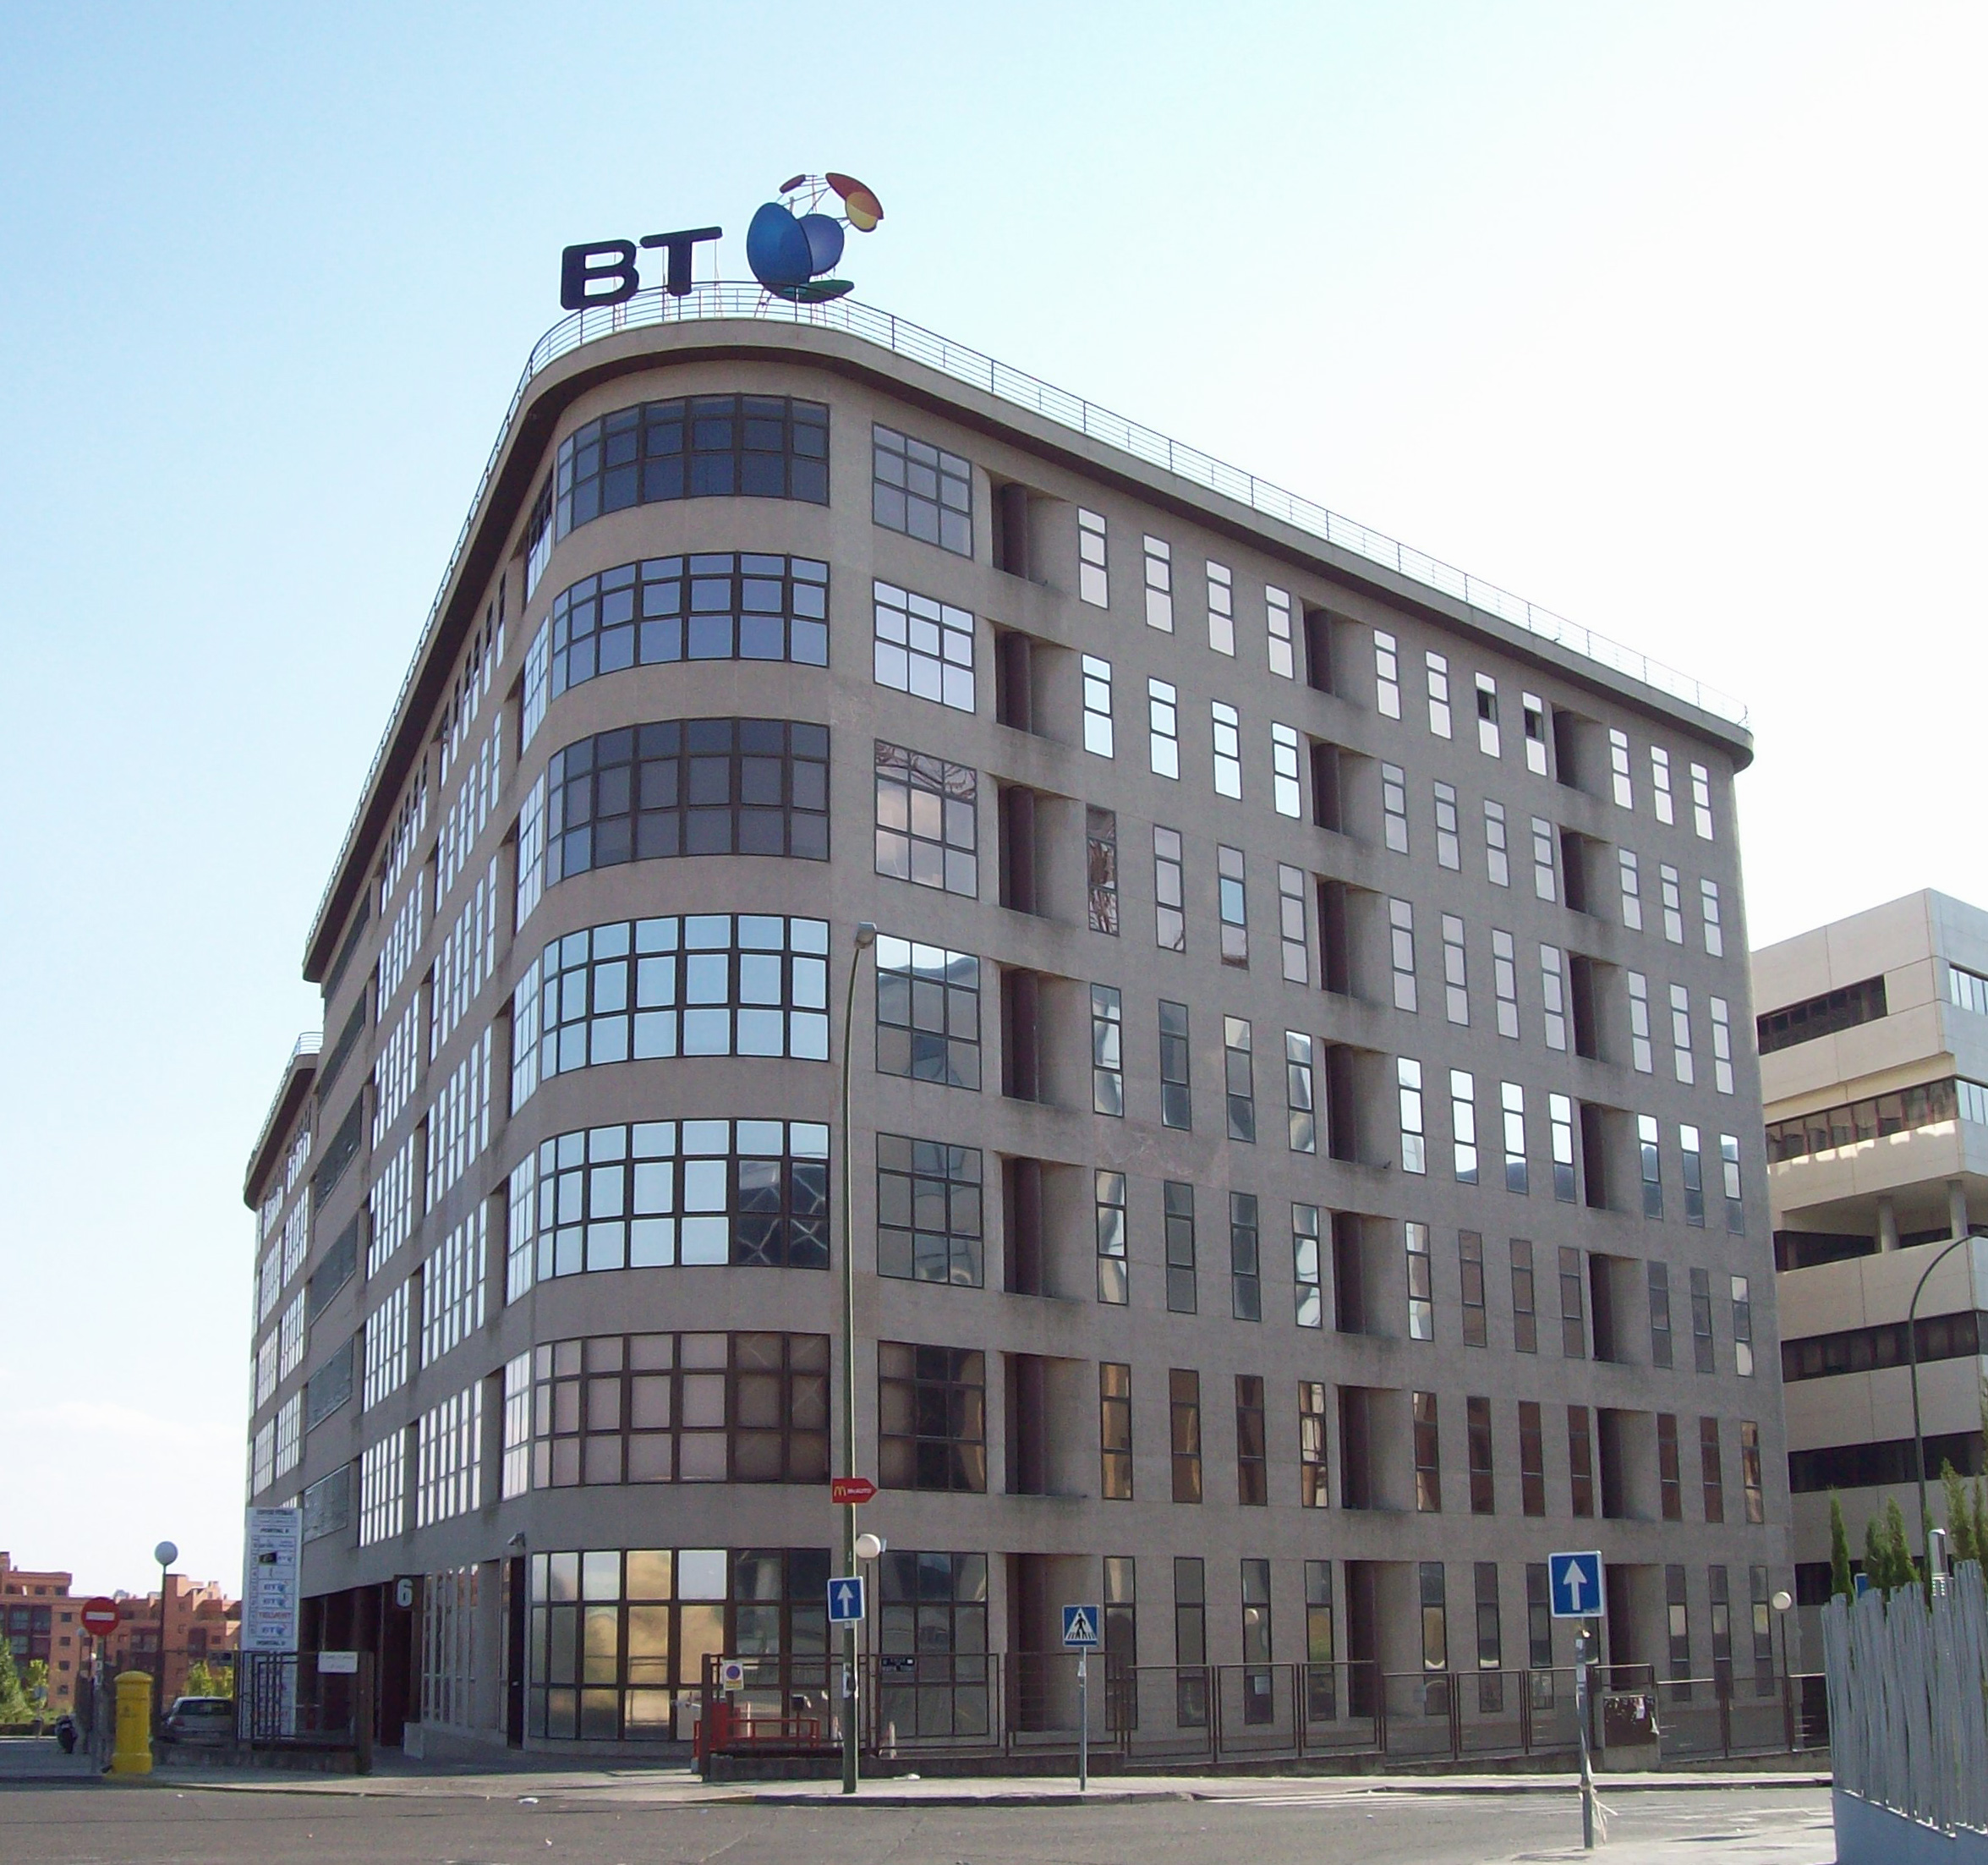 File:British Telecom offices in Madrid (Spain) 01 jpg